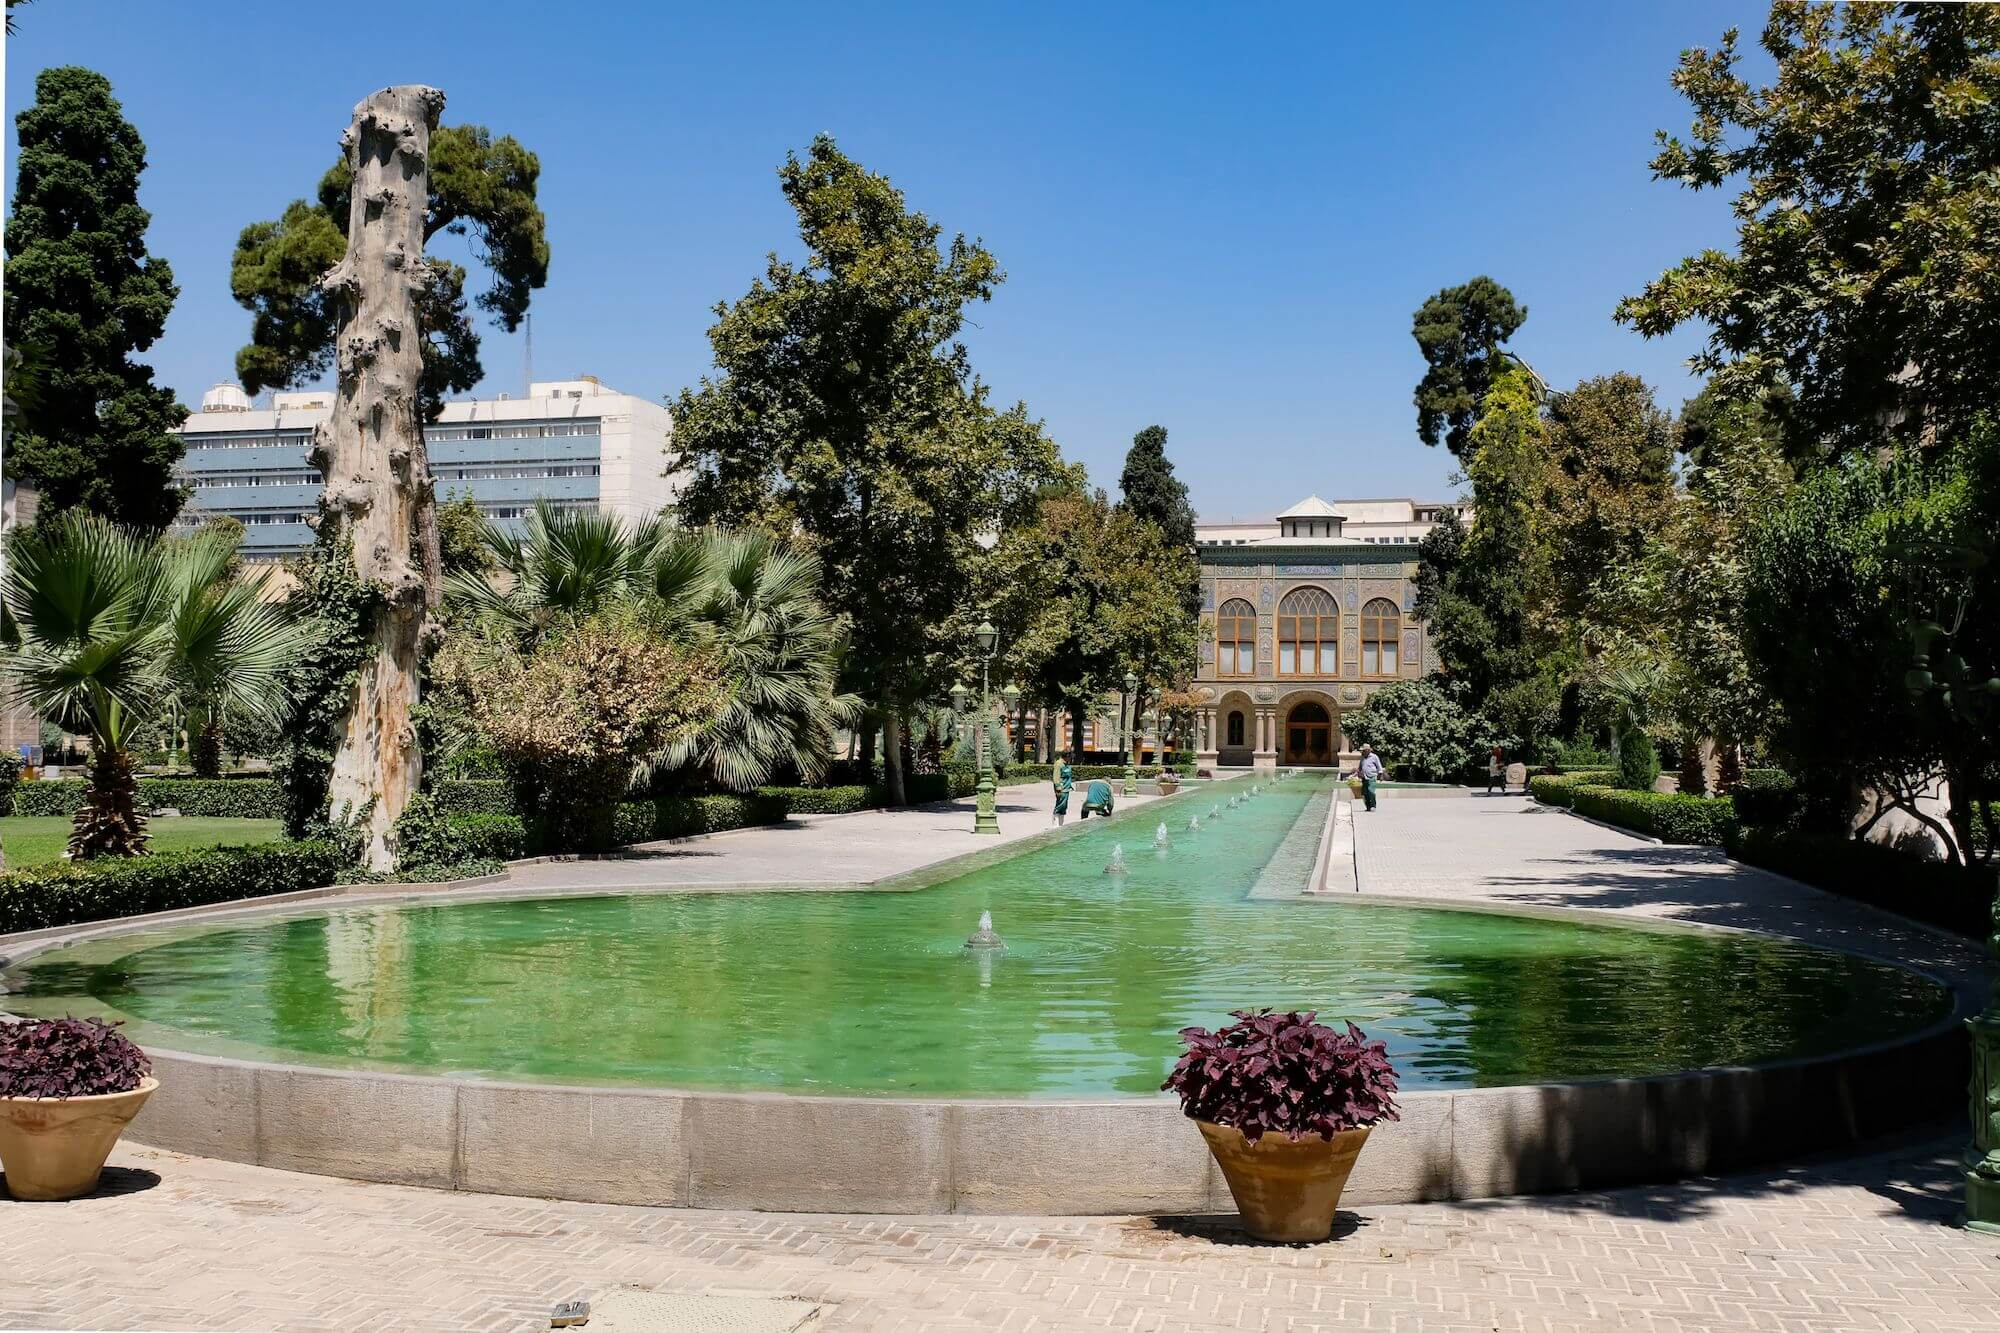 Teheran Golestan Palace 5 compressor 3 giorni a Teheran